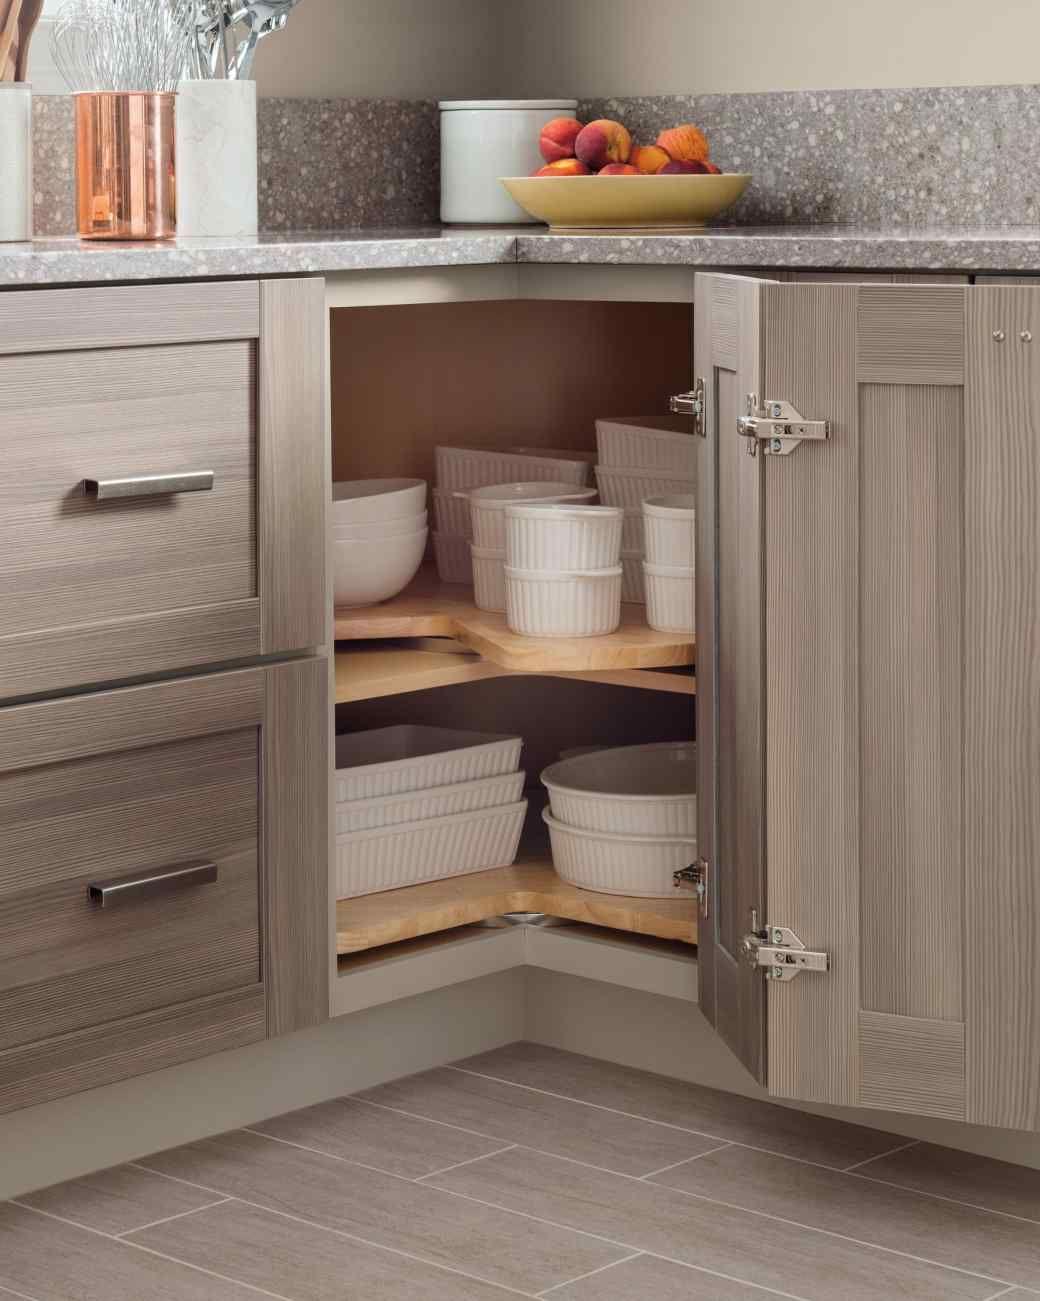 smart small kitchen ideas for a superior streamlined space kitchen cabinet design kitchen on kitchen cabinets organization layout id=21961